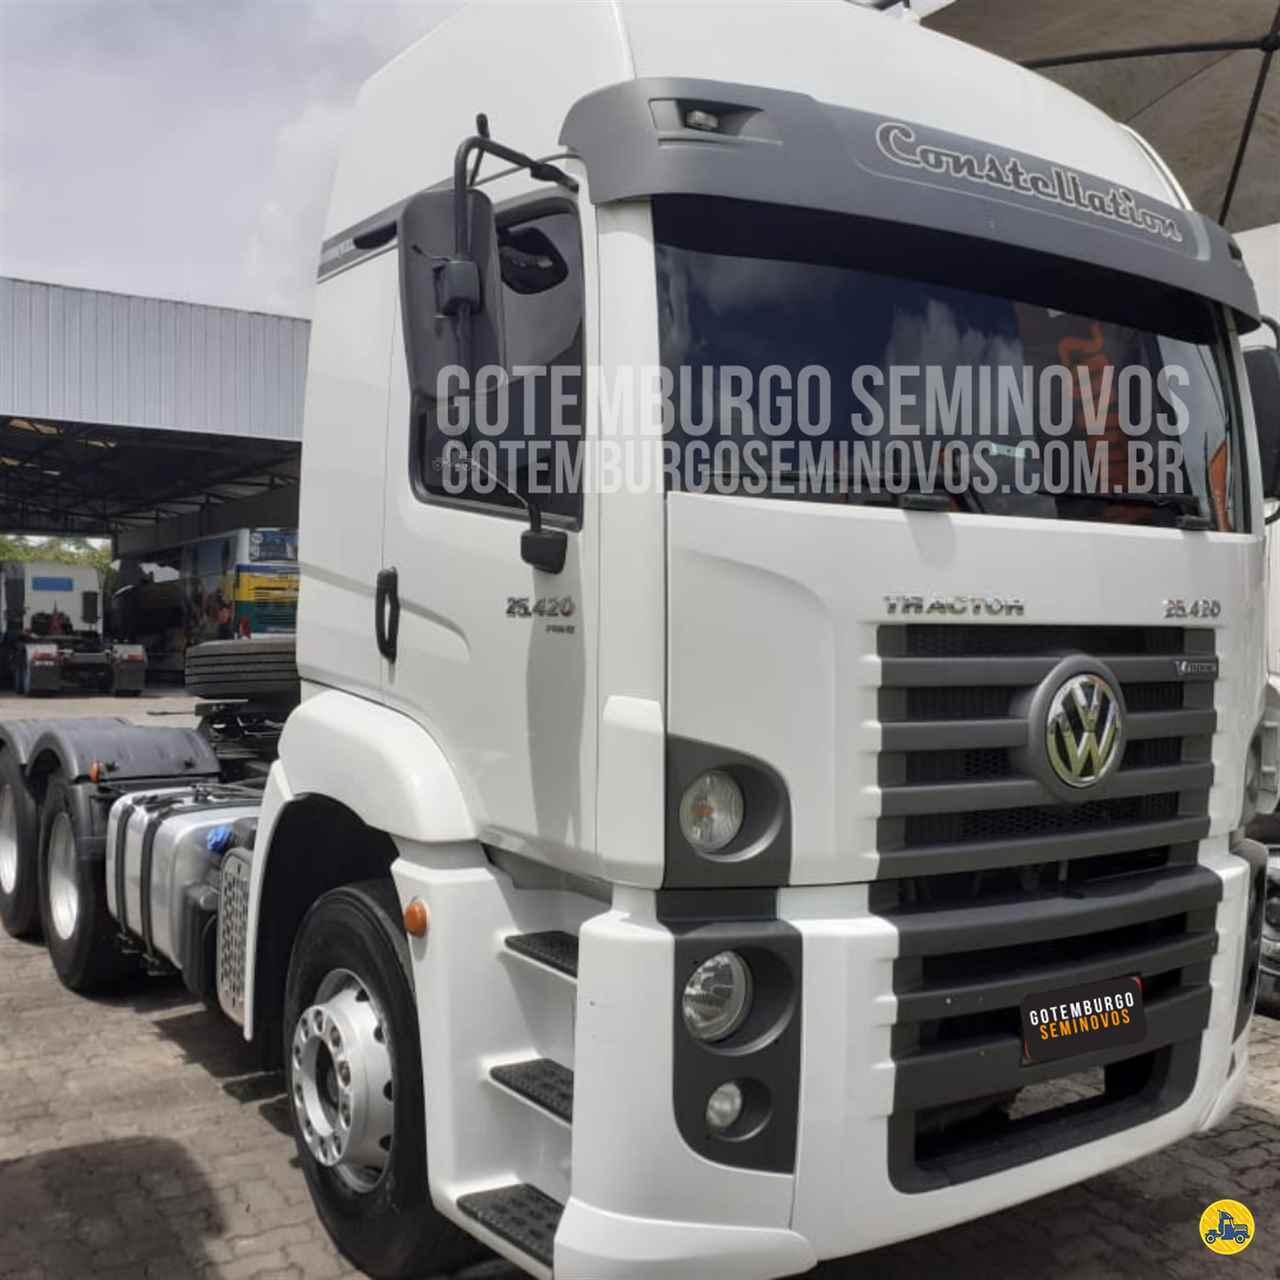 CAMINHAO VOLKSWAGEN VW 25420 Cavalo Mecânico Truck 6x2 GOTEMBURGO | SEMINOVOS SIMOES FILHO BAHIA BA